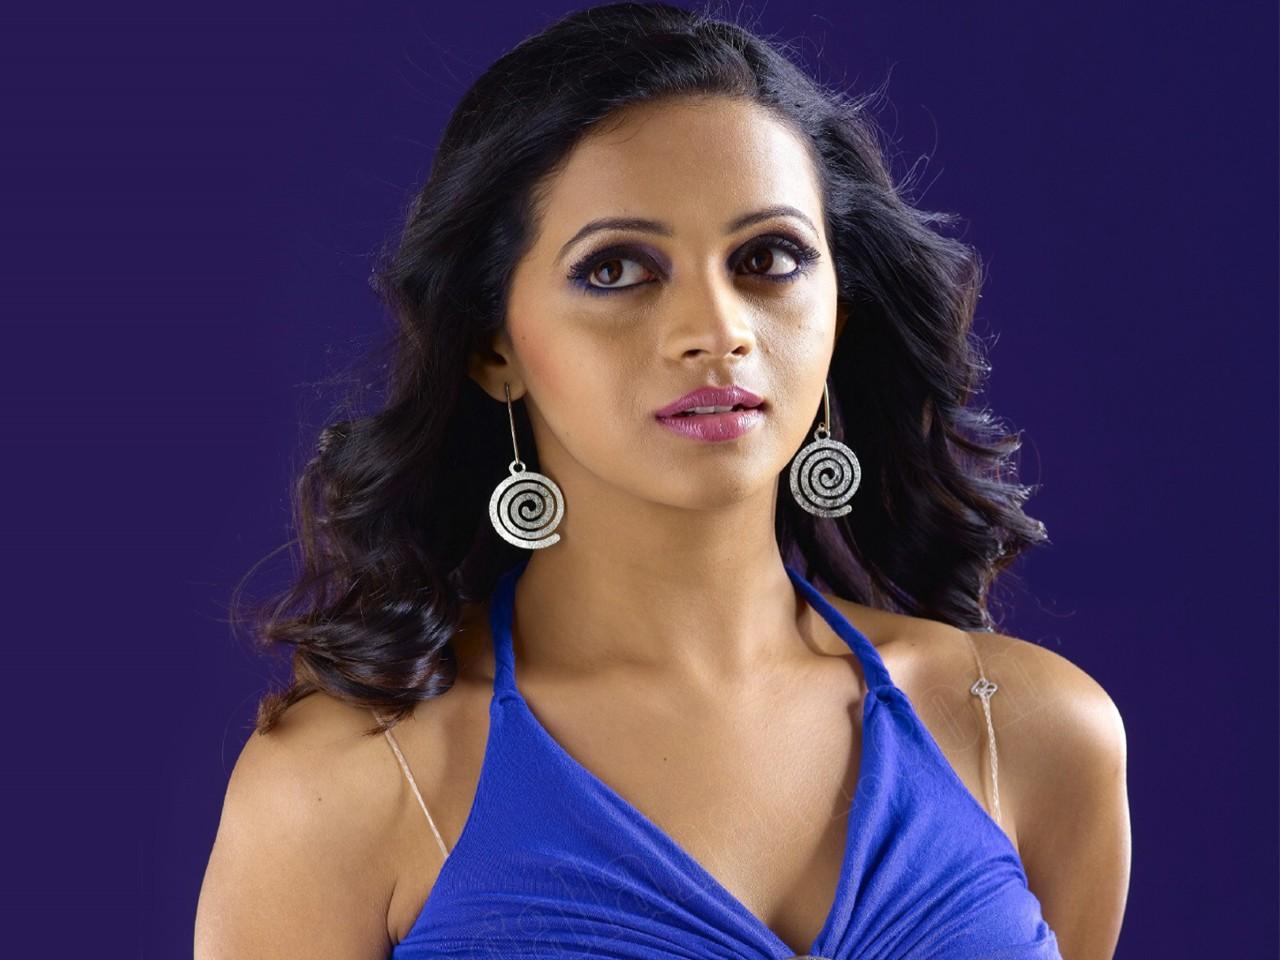 Bollywood Beautiful Girl Wallpaper Download South Indian Actress